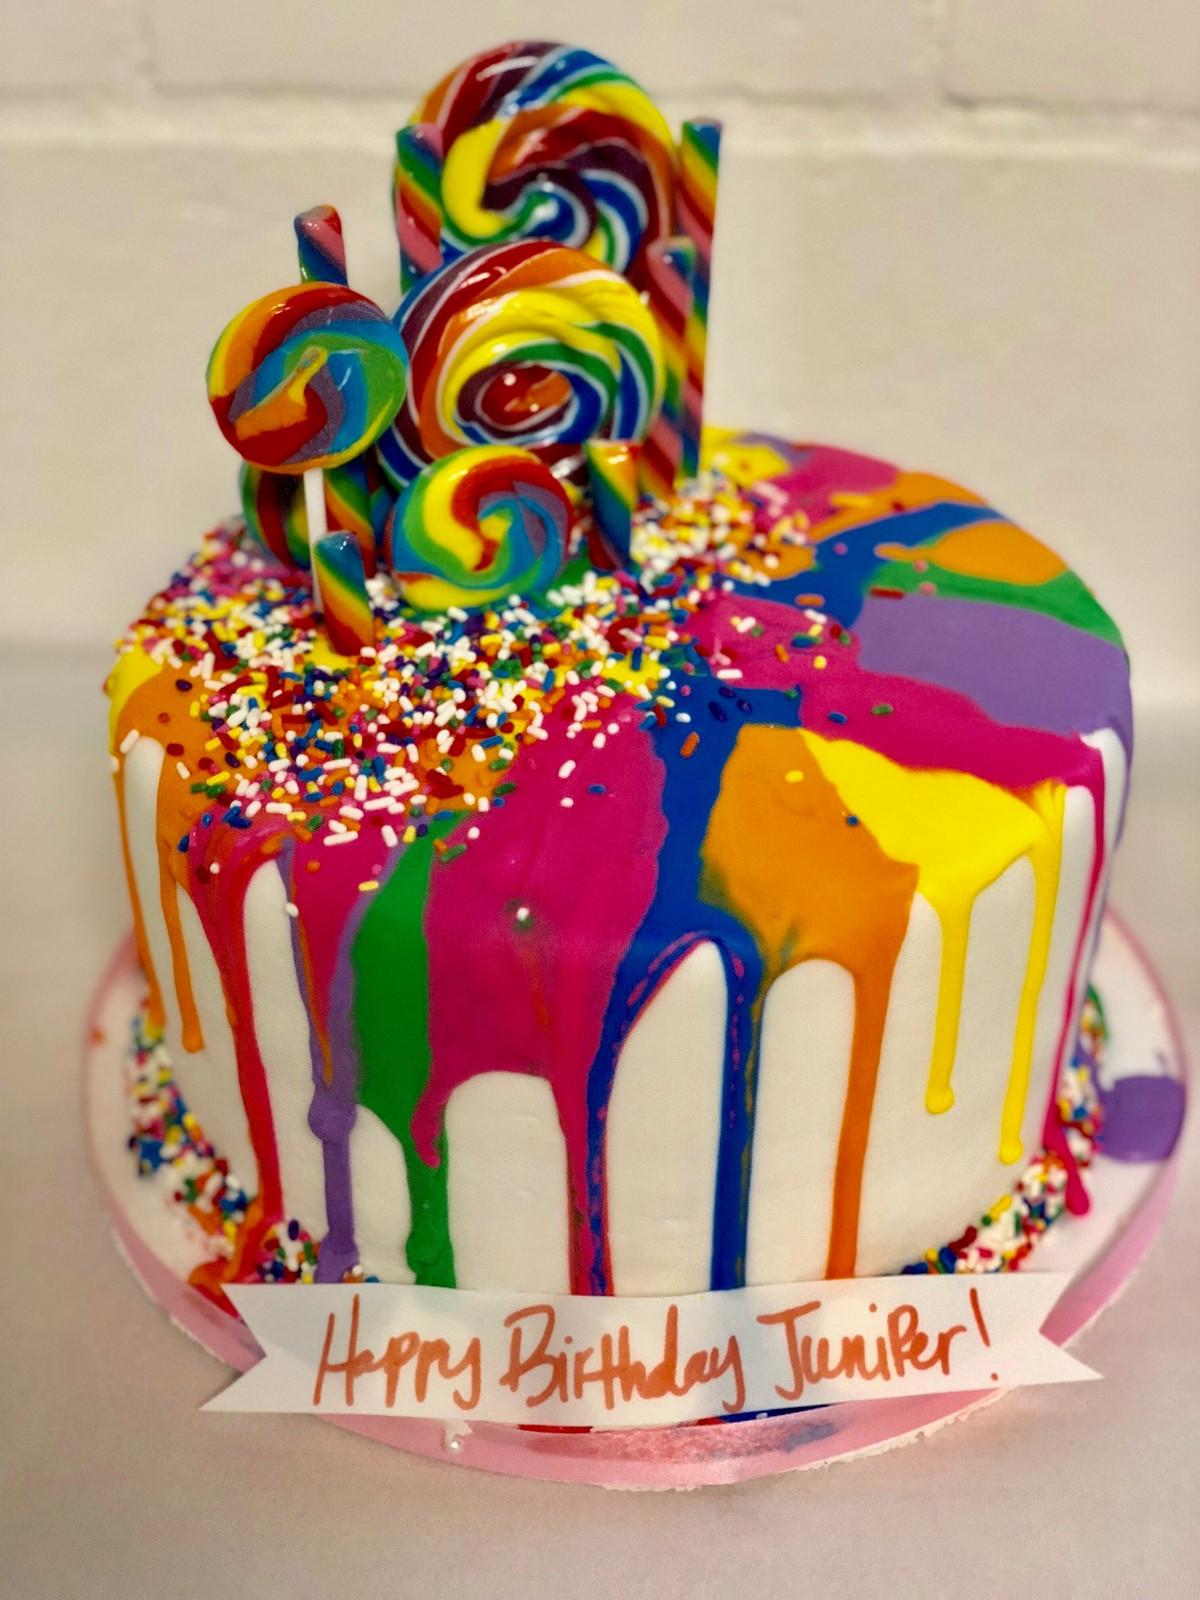 MultiColored Drip Candy Cake CBG145 Custom Cakes Wedding Cakes